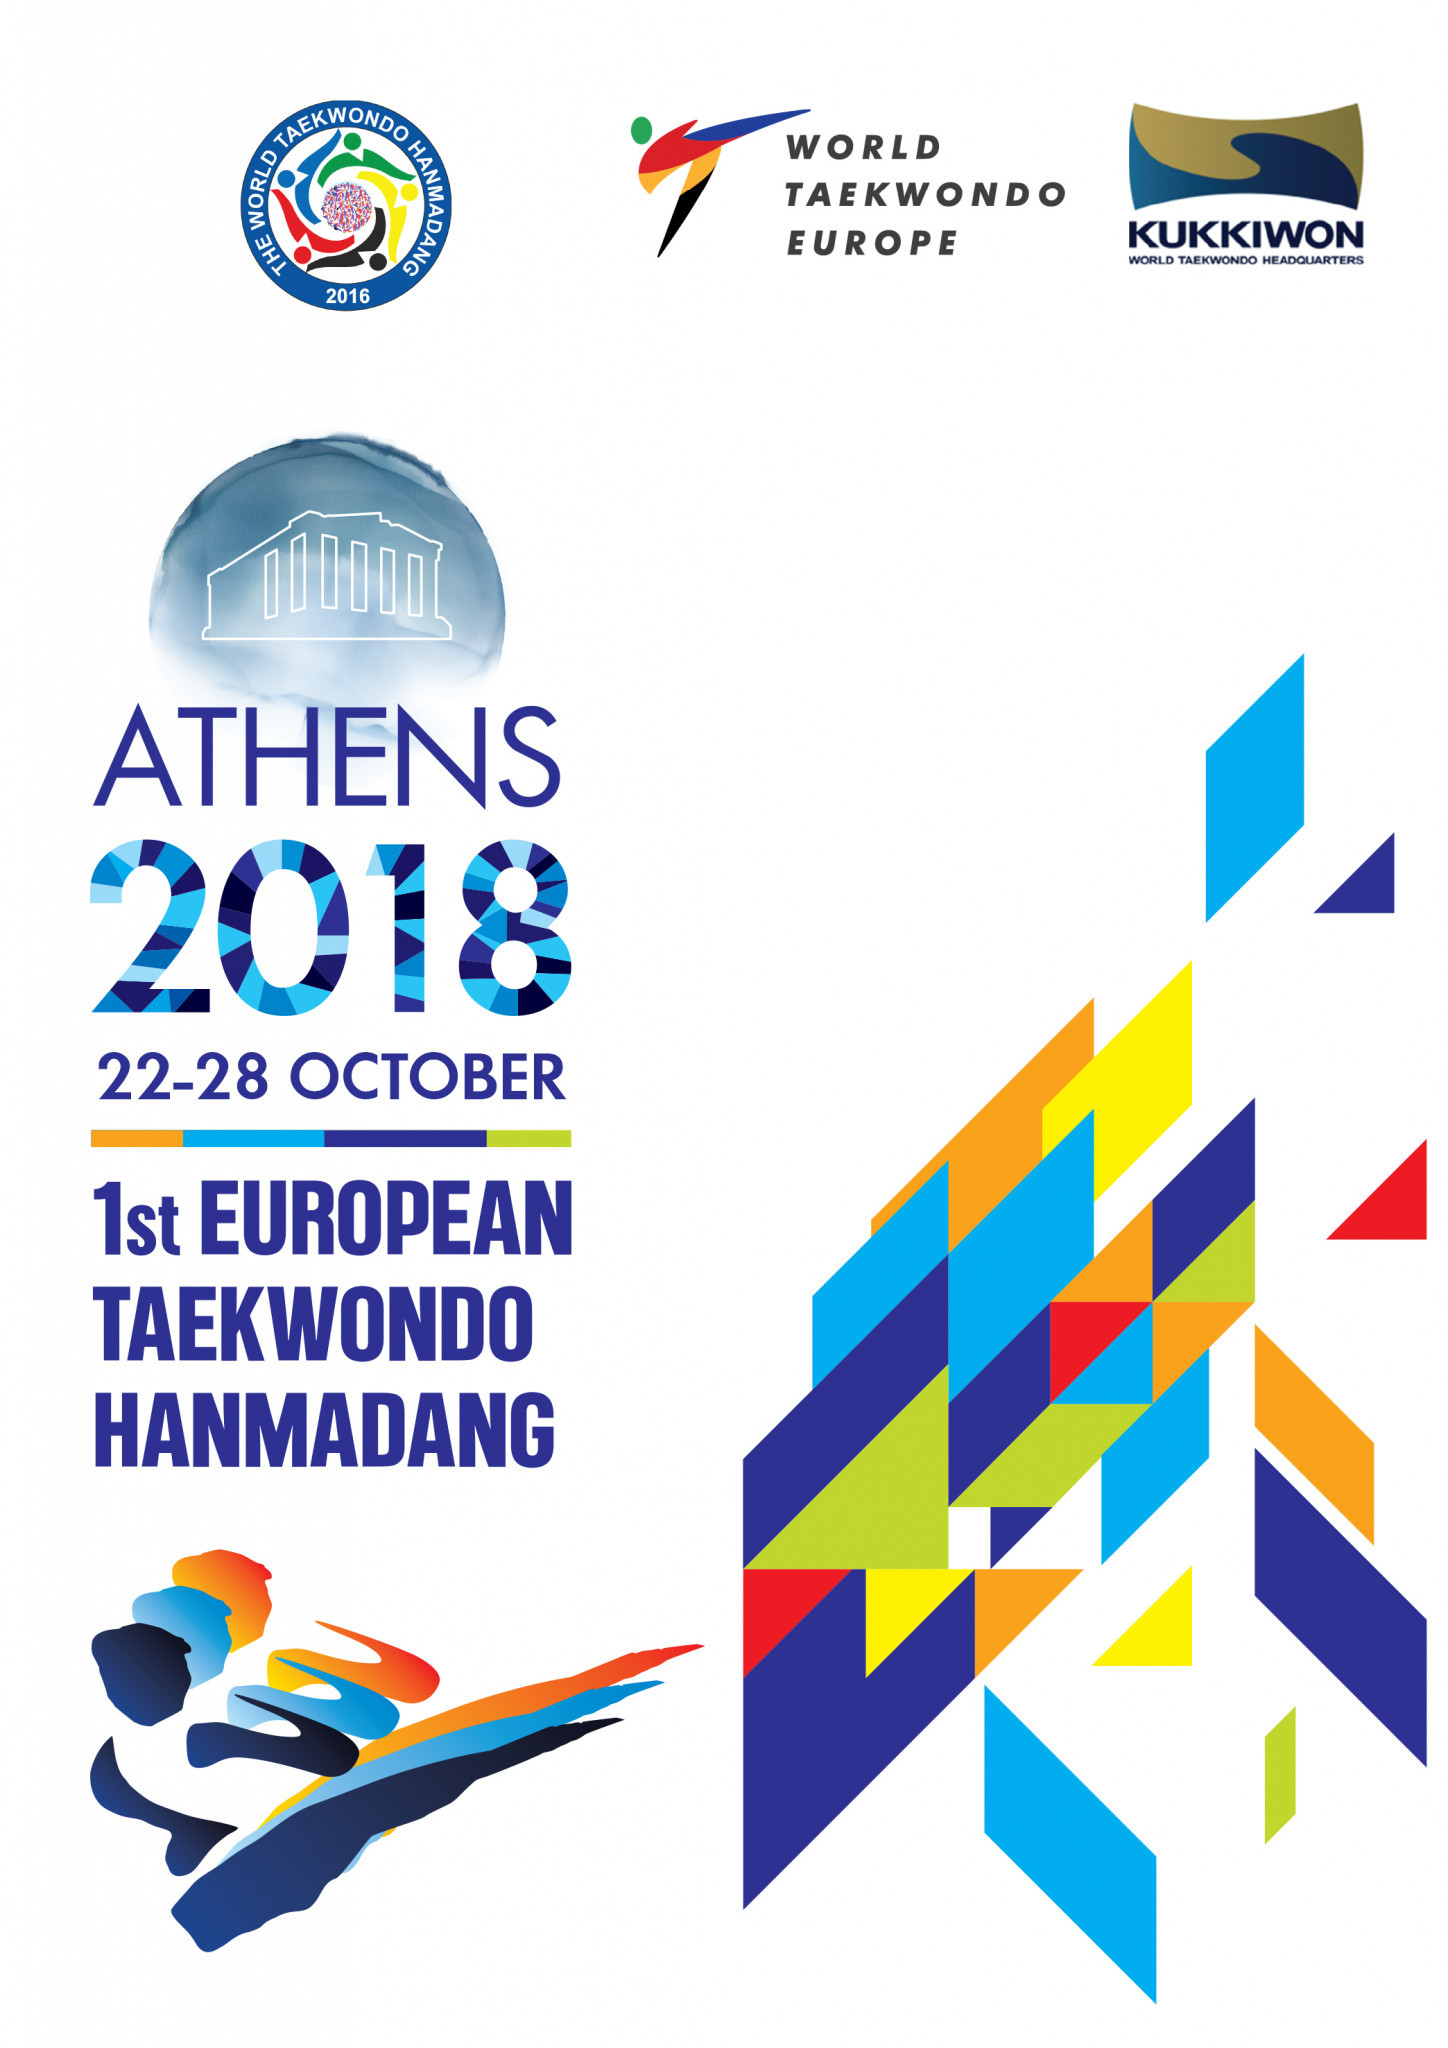 World Taekwondo Europe announce details of first Hanmadang festival